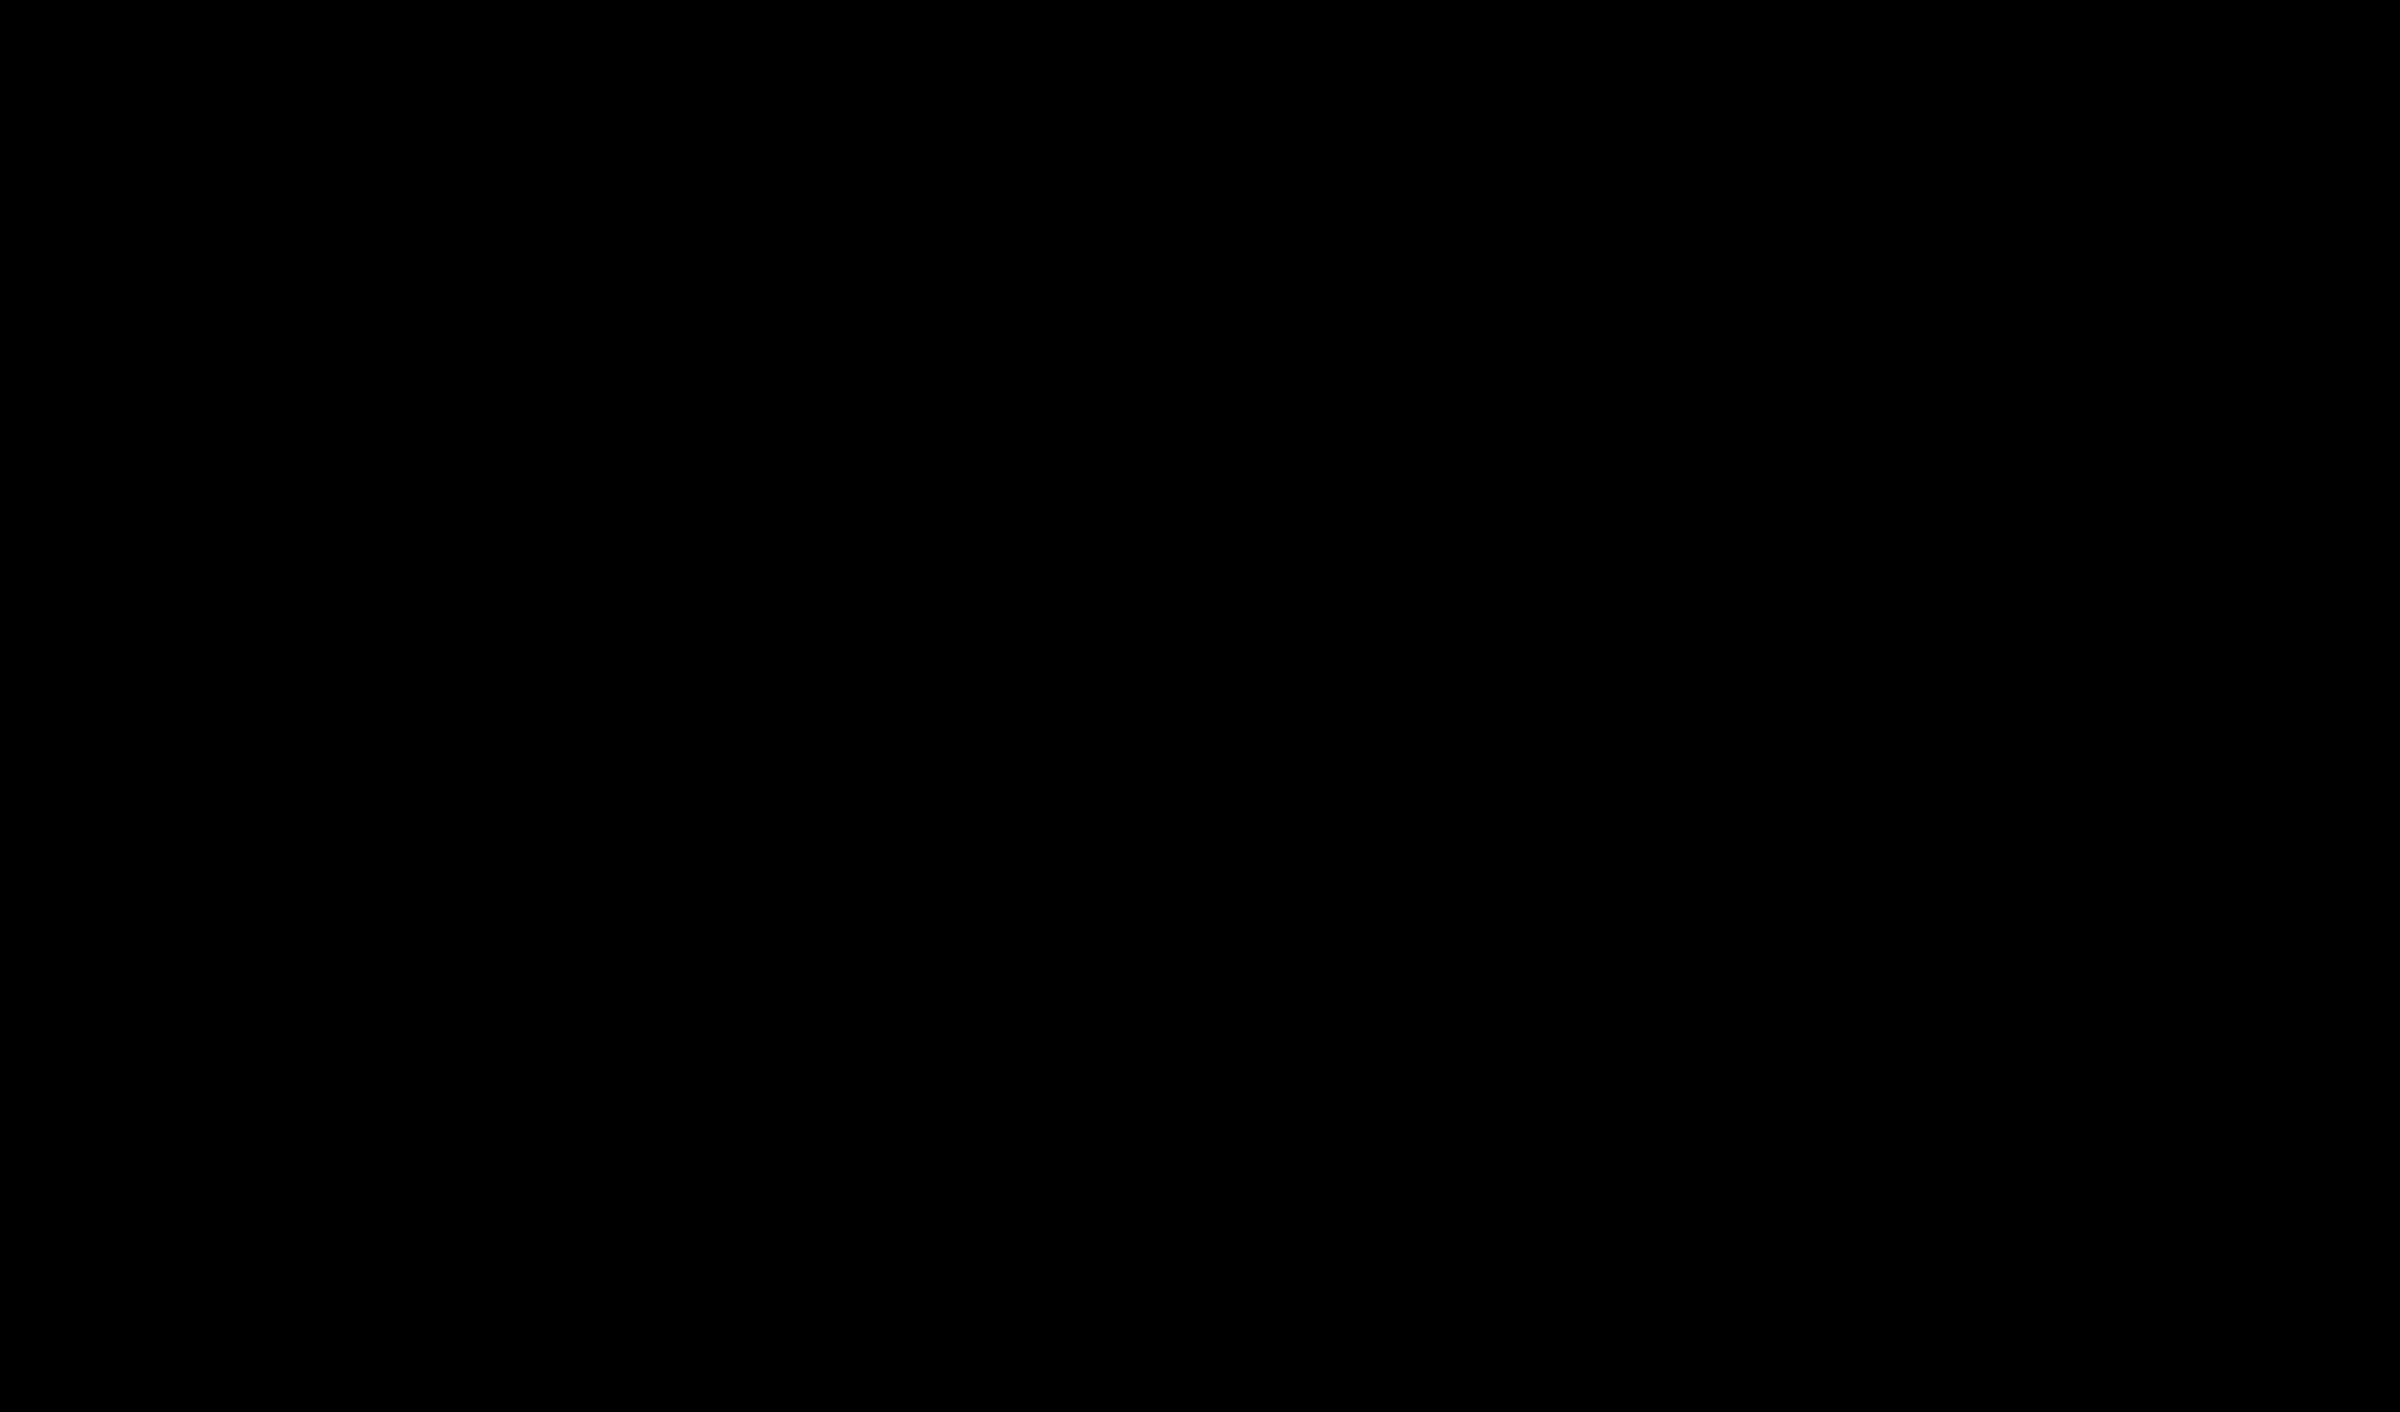 2400x1412 Clipart